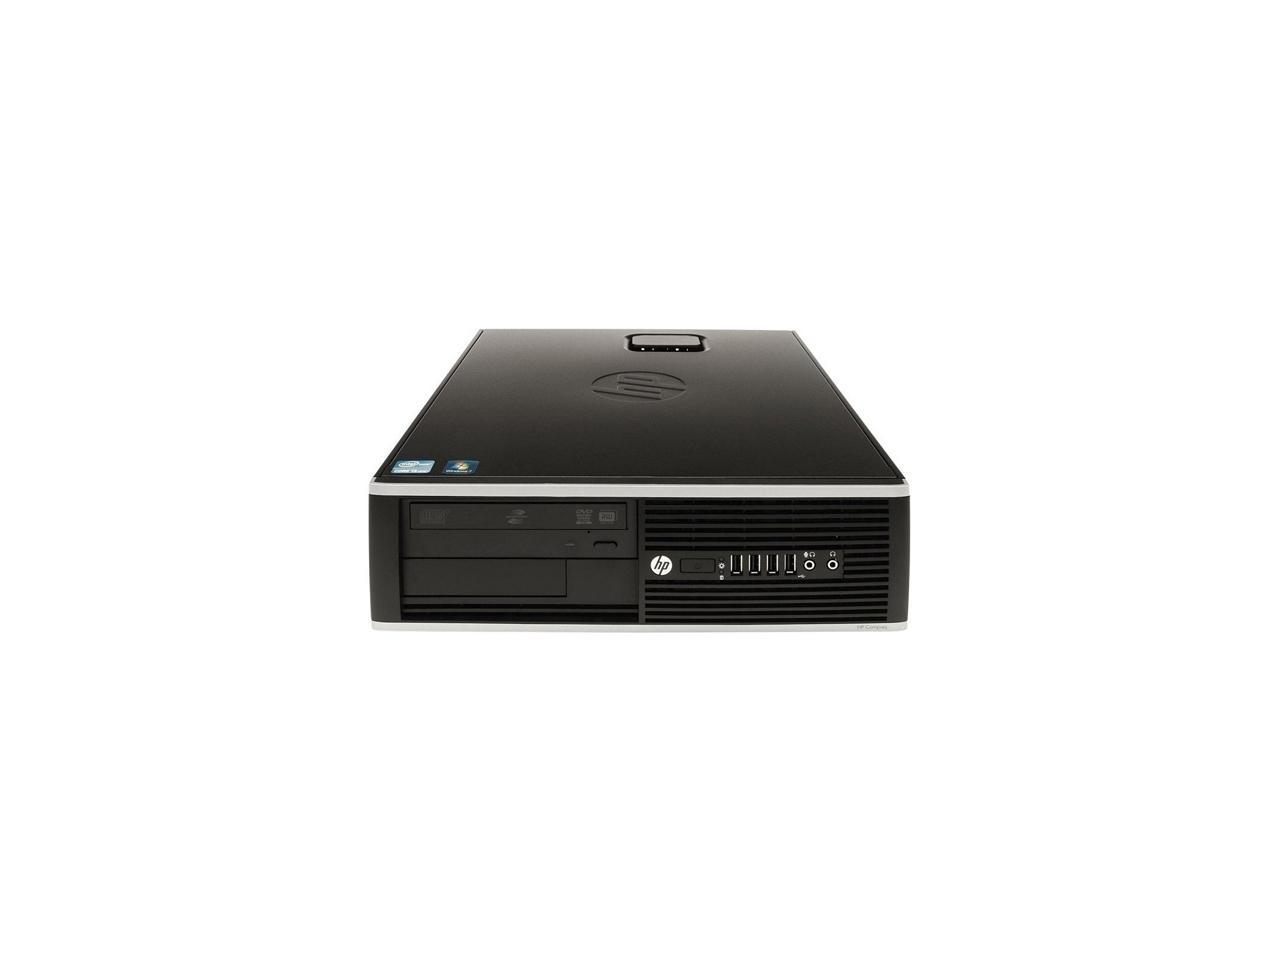 Refurbished: HP Compaq Desktop Computer 6000 Pro Core 2 Duo E8400 (3.00 GHz) 4 GB DDR3 160 GB HDD Windows 10 Home 64-Bit